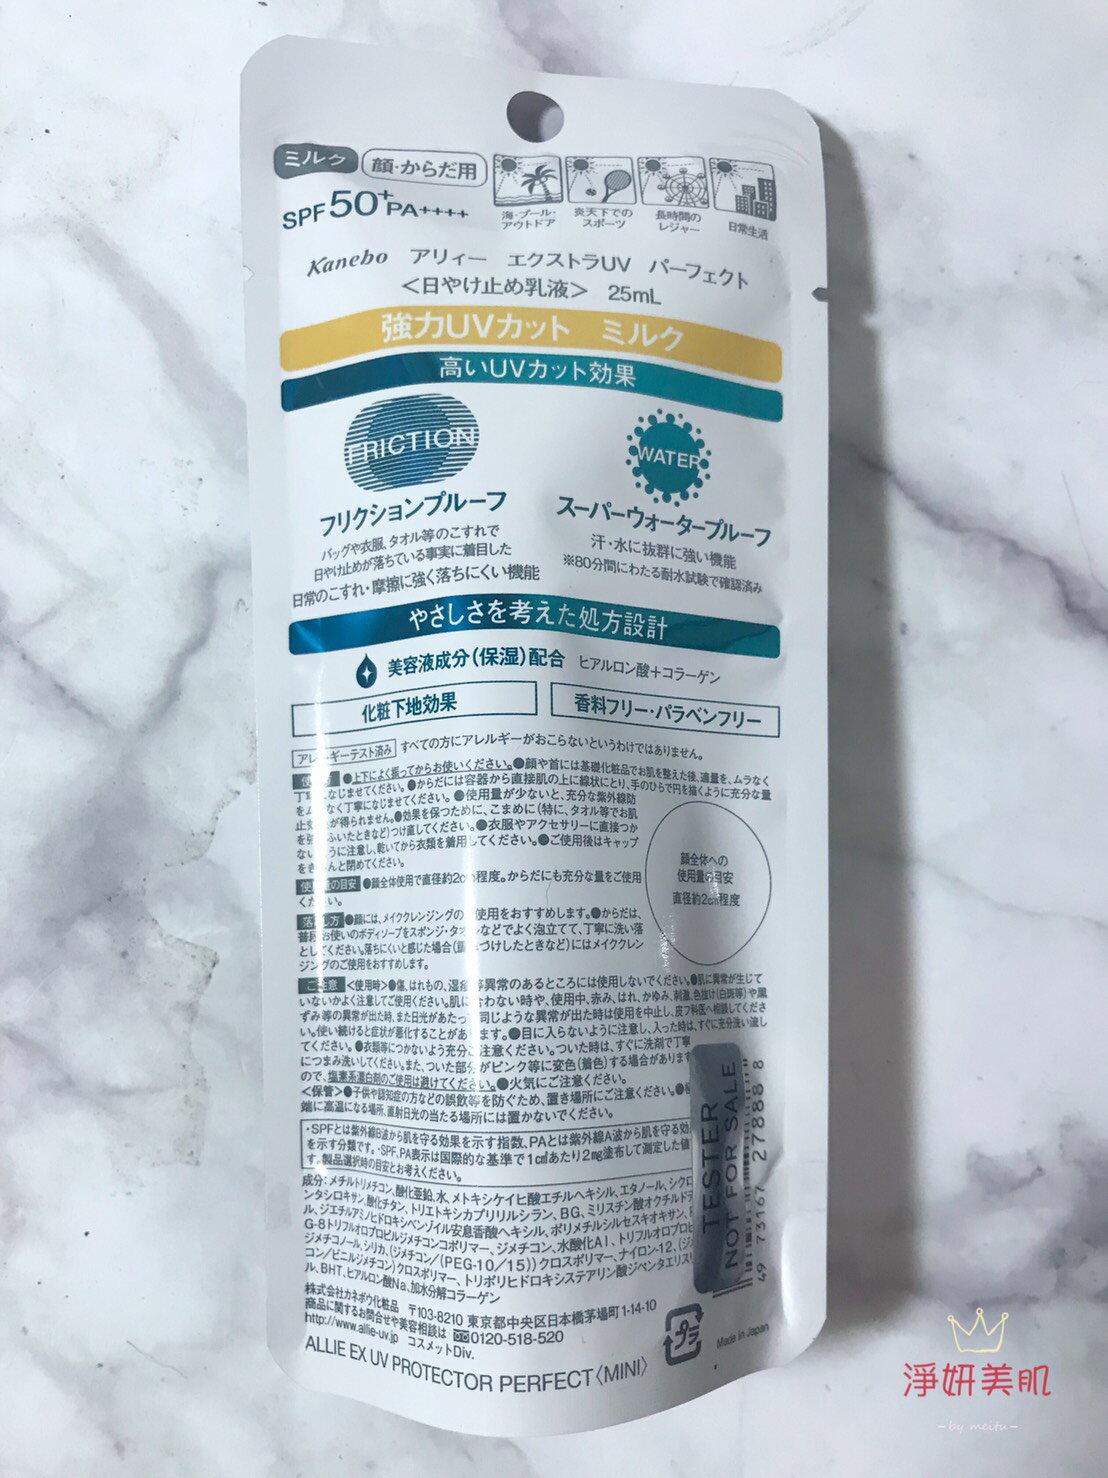 【Kanebo 佳麗寶】 ALLIE EX UV完美高效防曬乳 25ml 效期202201【淨妍美肌】 1